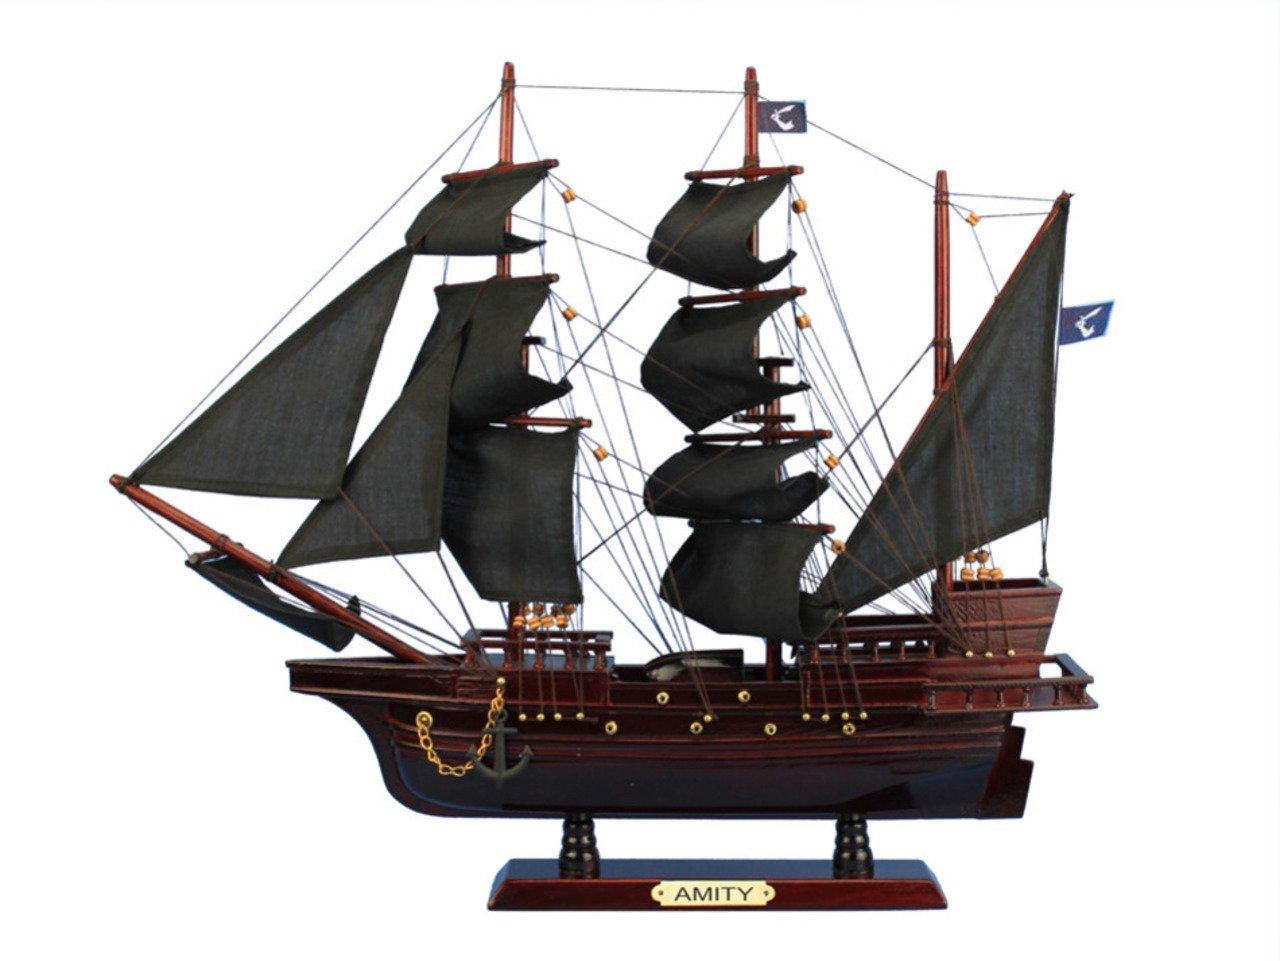 Hampton Nautical Wooden Thomas Tew's Amity Model Pirate Ship, 20''